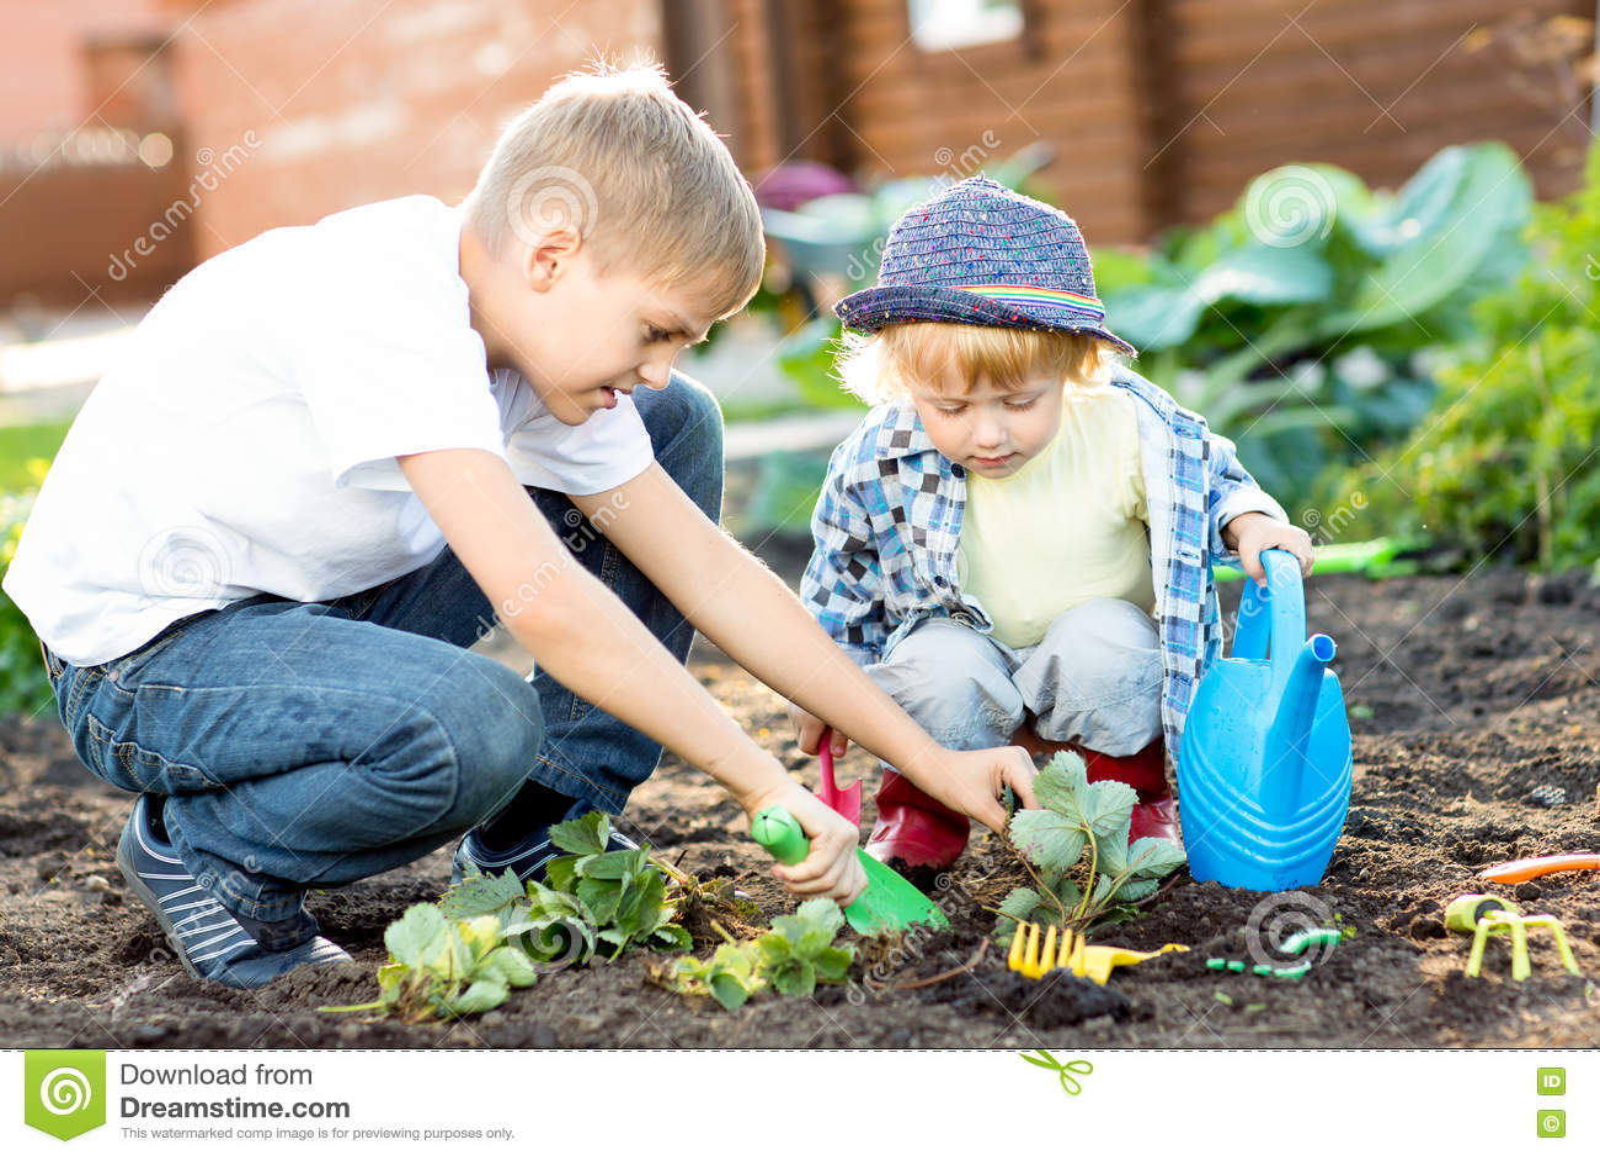 Kids planting strawberry seedling into fertile soil outside in garden